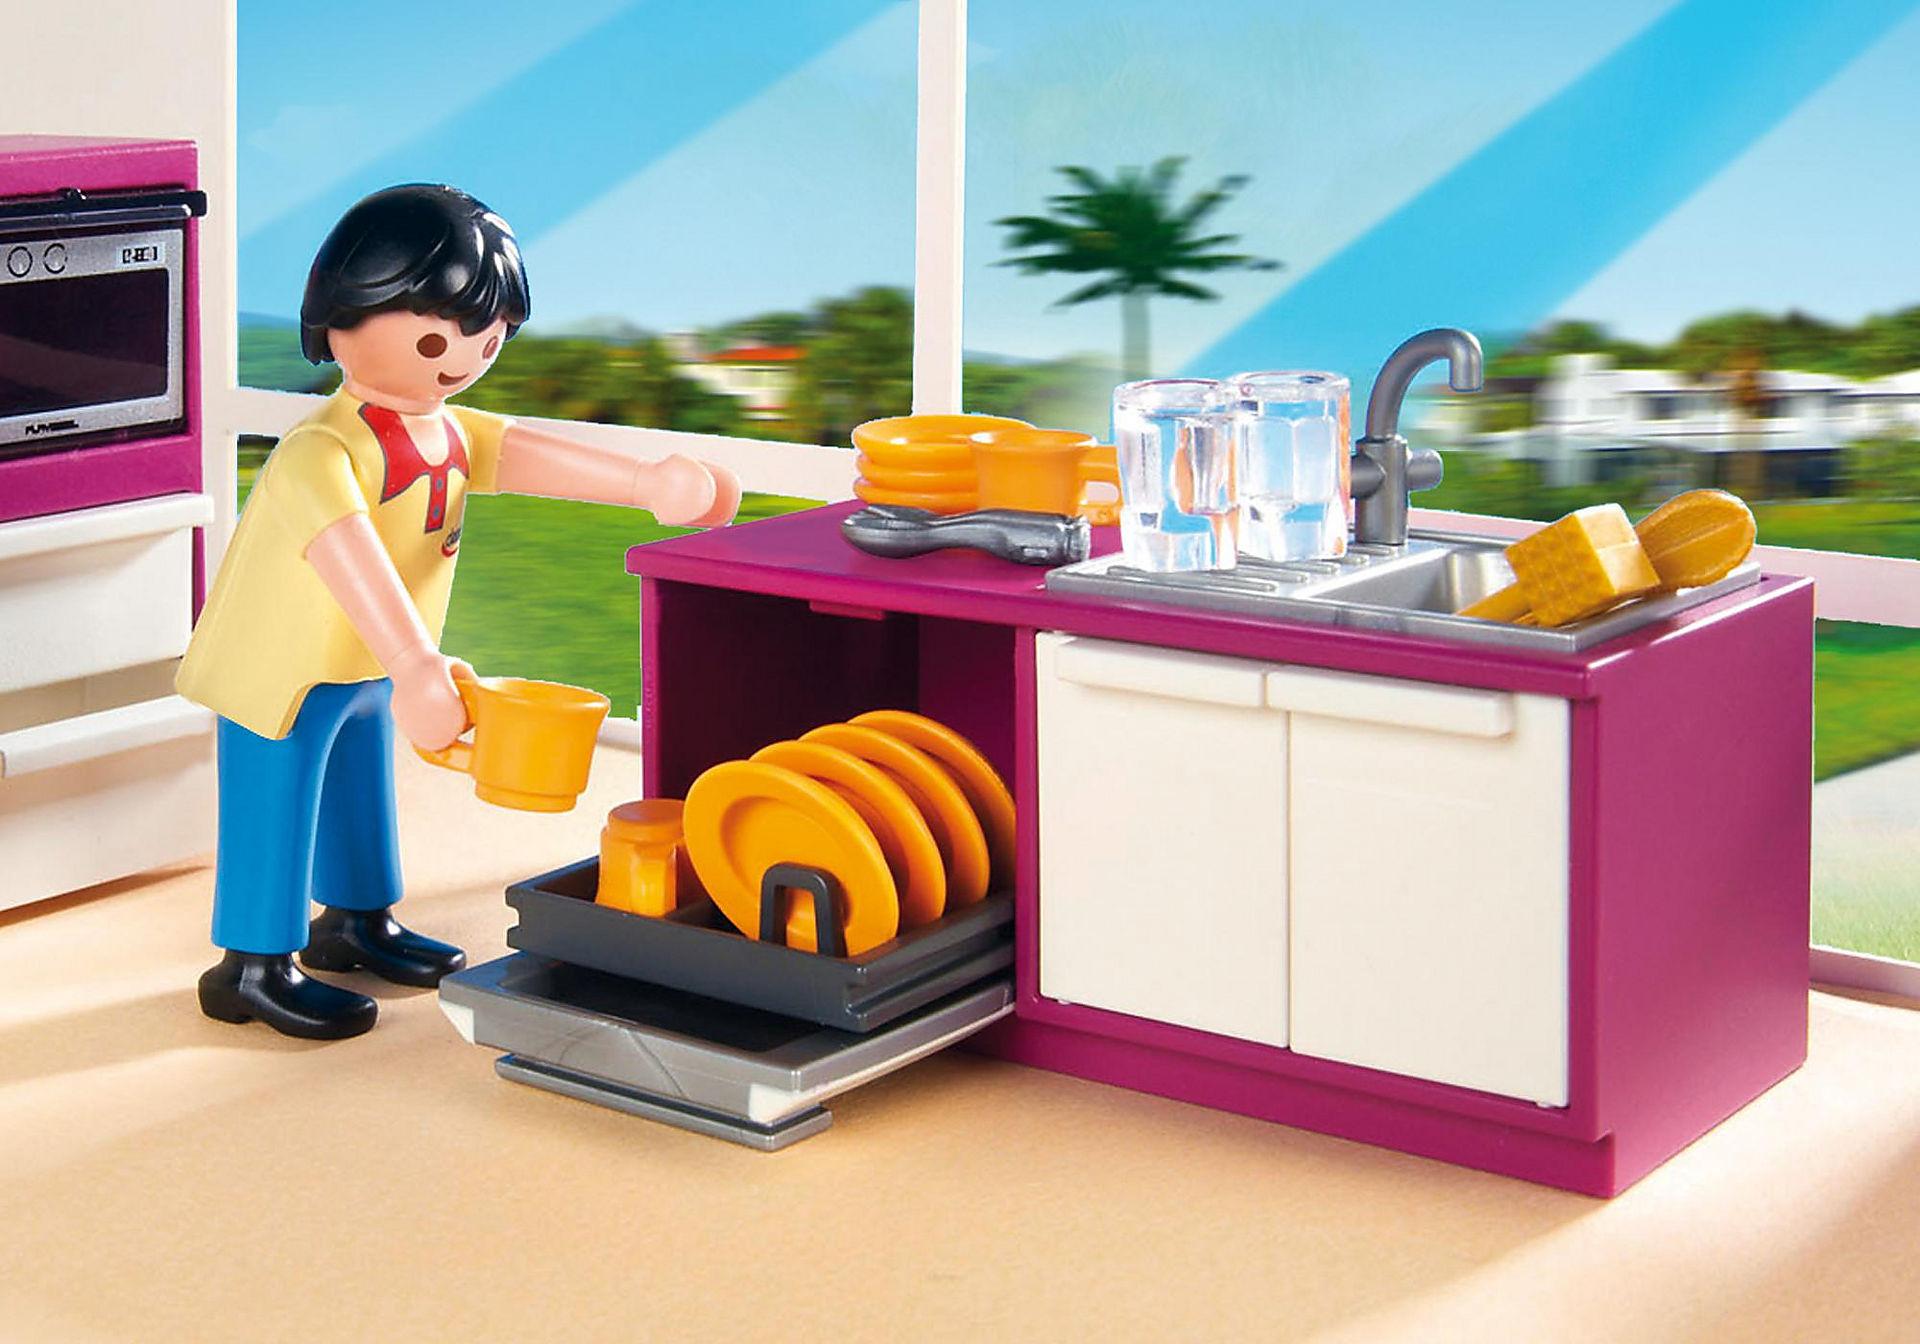 http://media.playmobil.com/i/playmobil/5582_product_extra2/Cucina con isola attrezzata